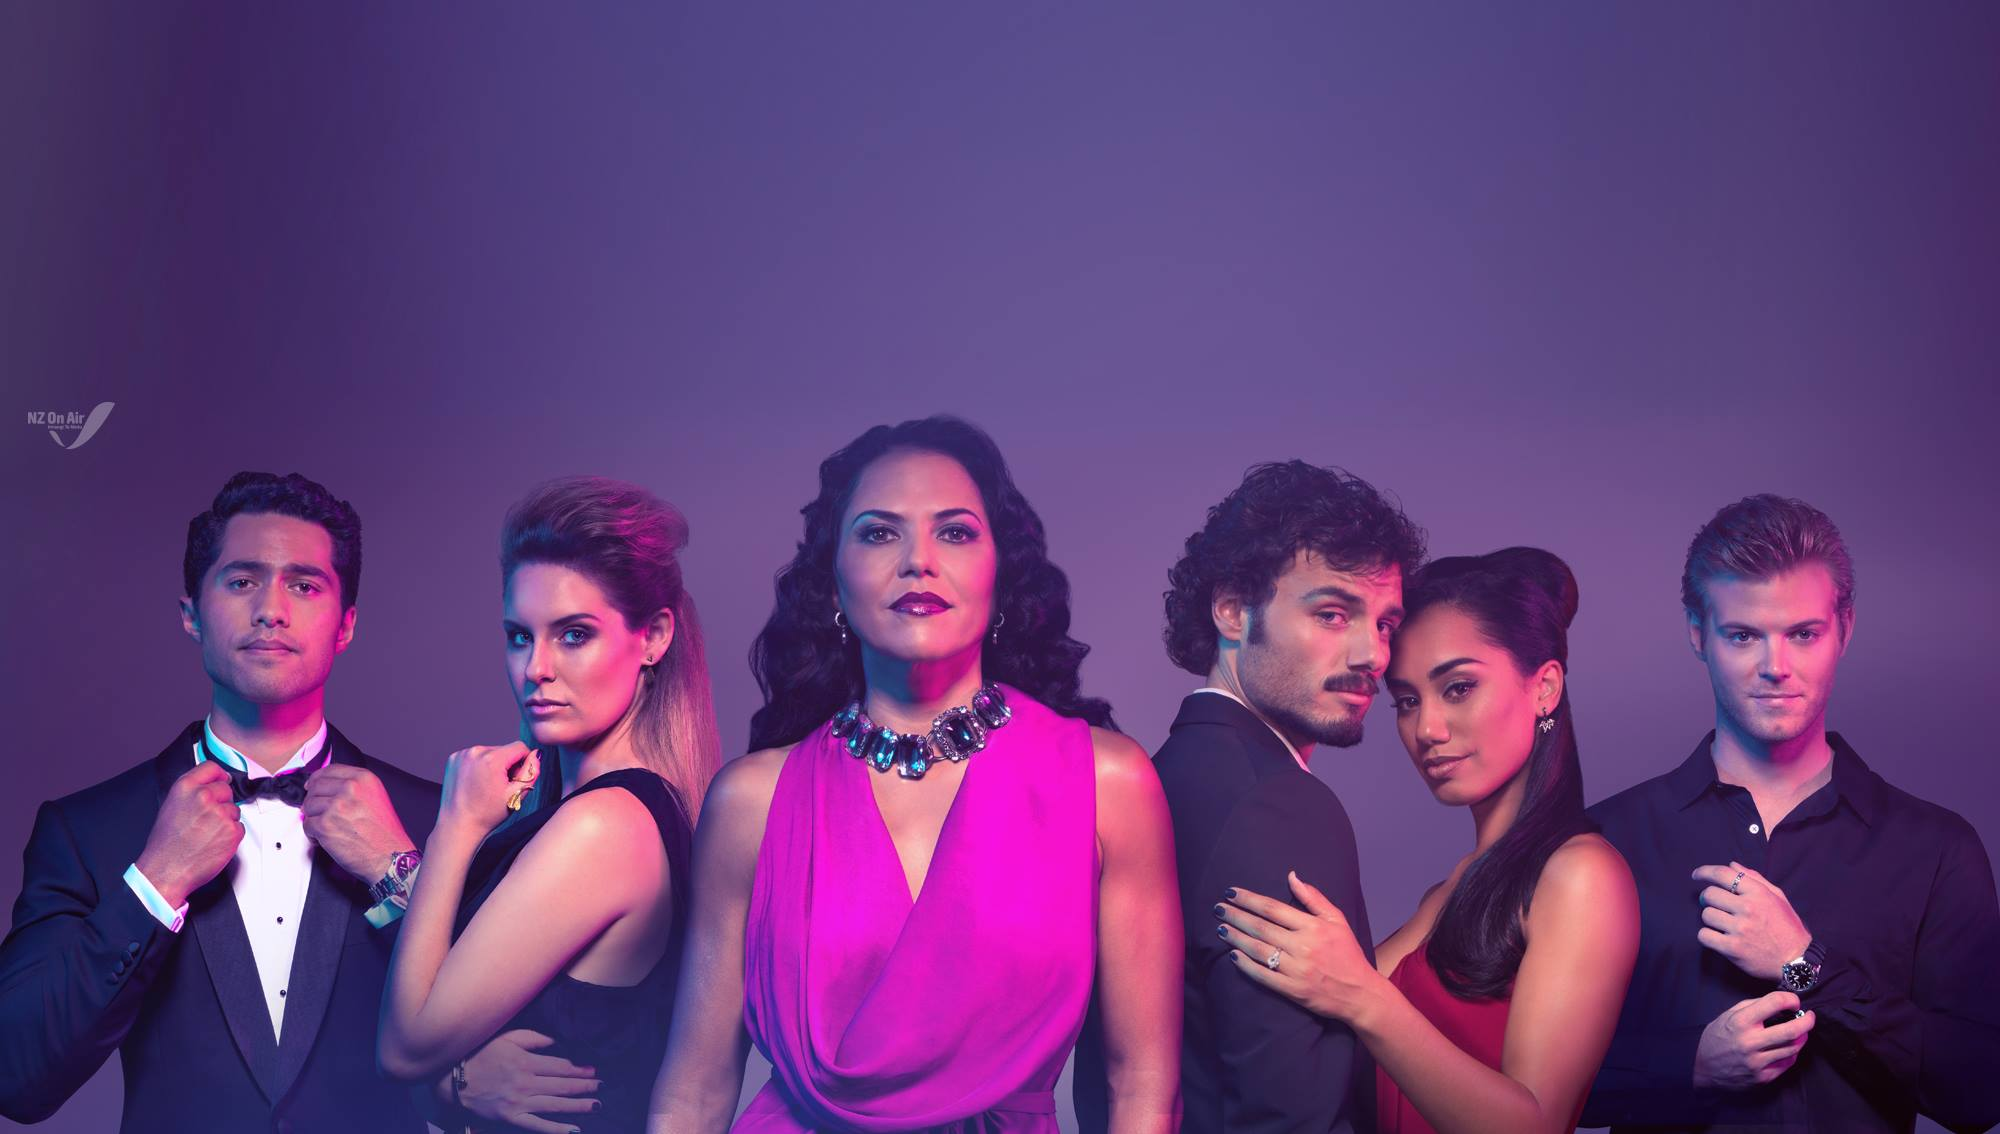 local glam tv drama series